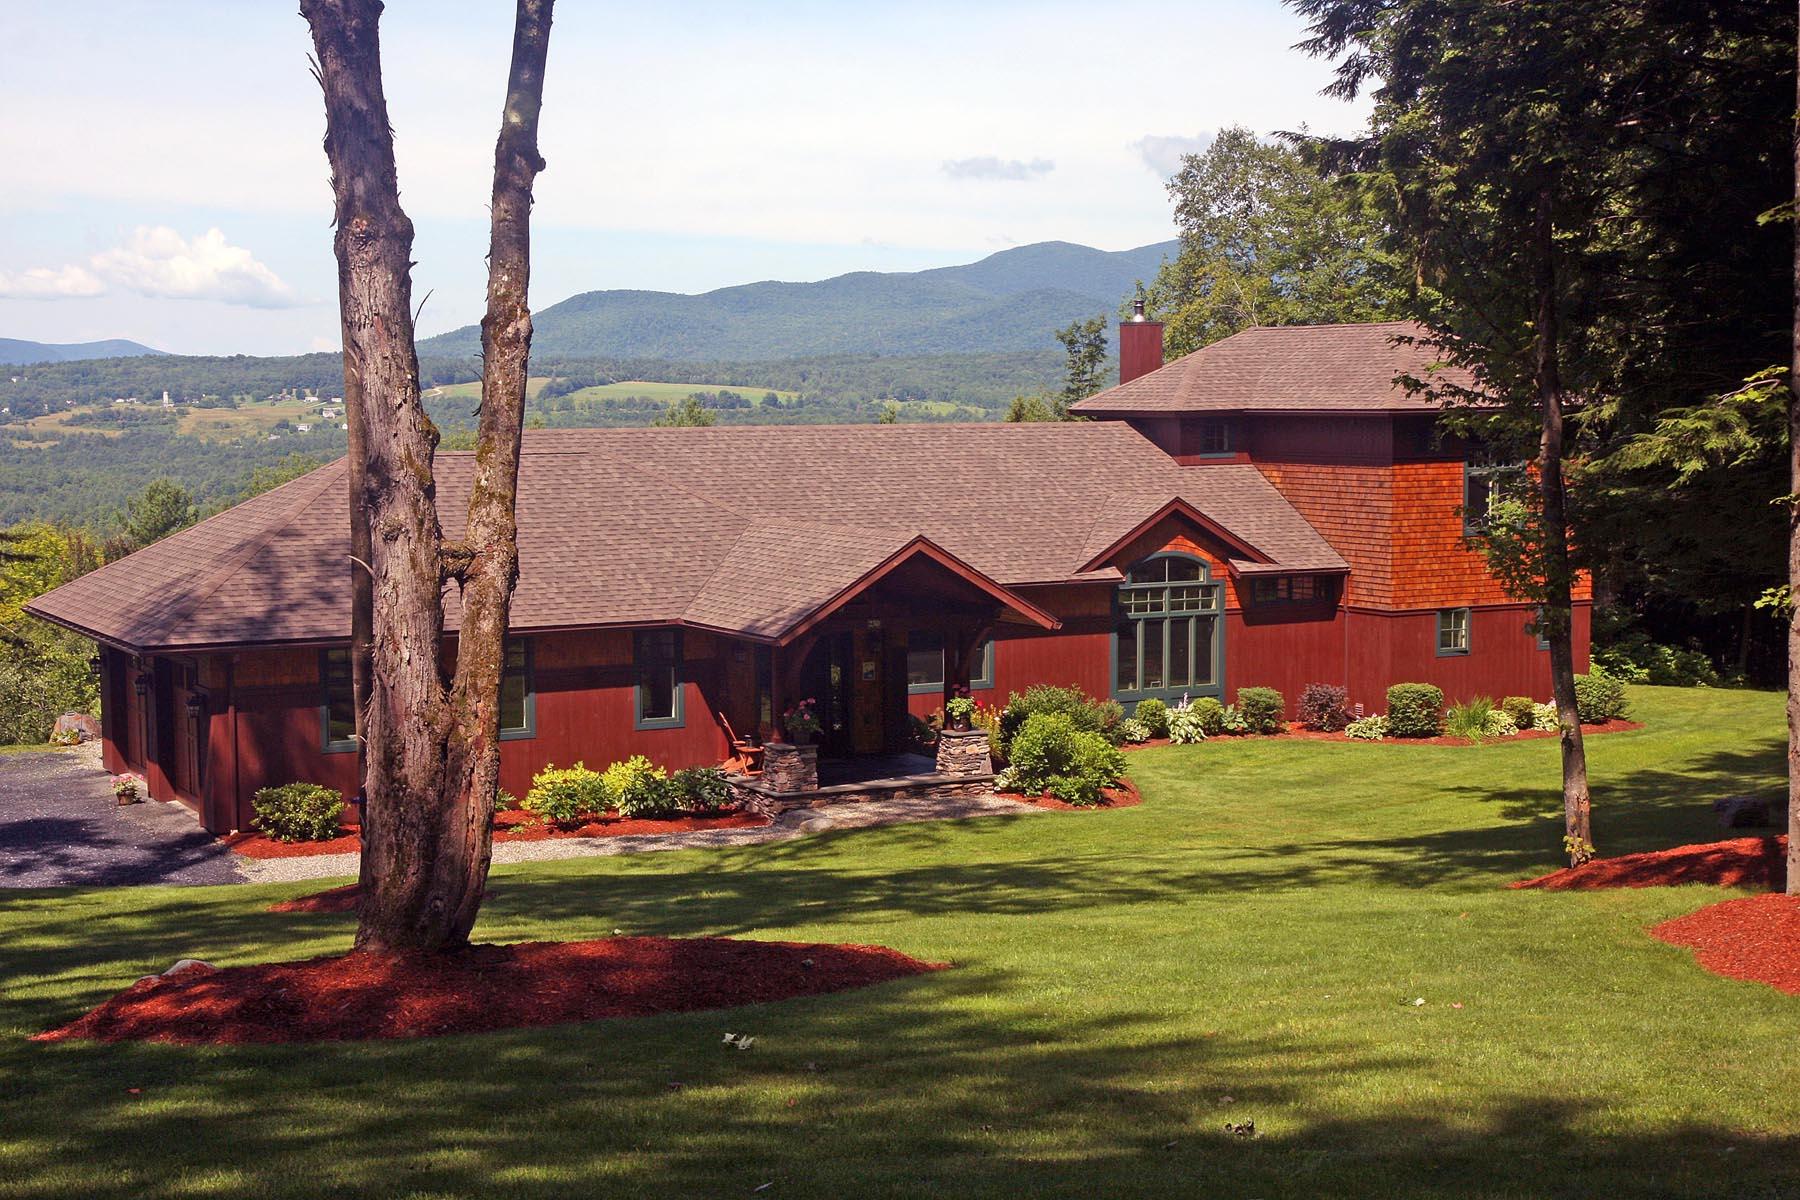 Moradia para Venda às 230 Evergreen Woods, Waterbury Waterbury, Vermont 05677 Estados Unidos